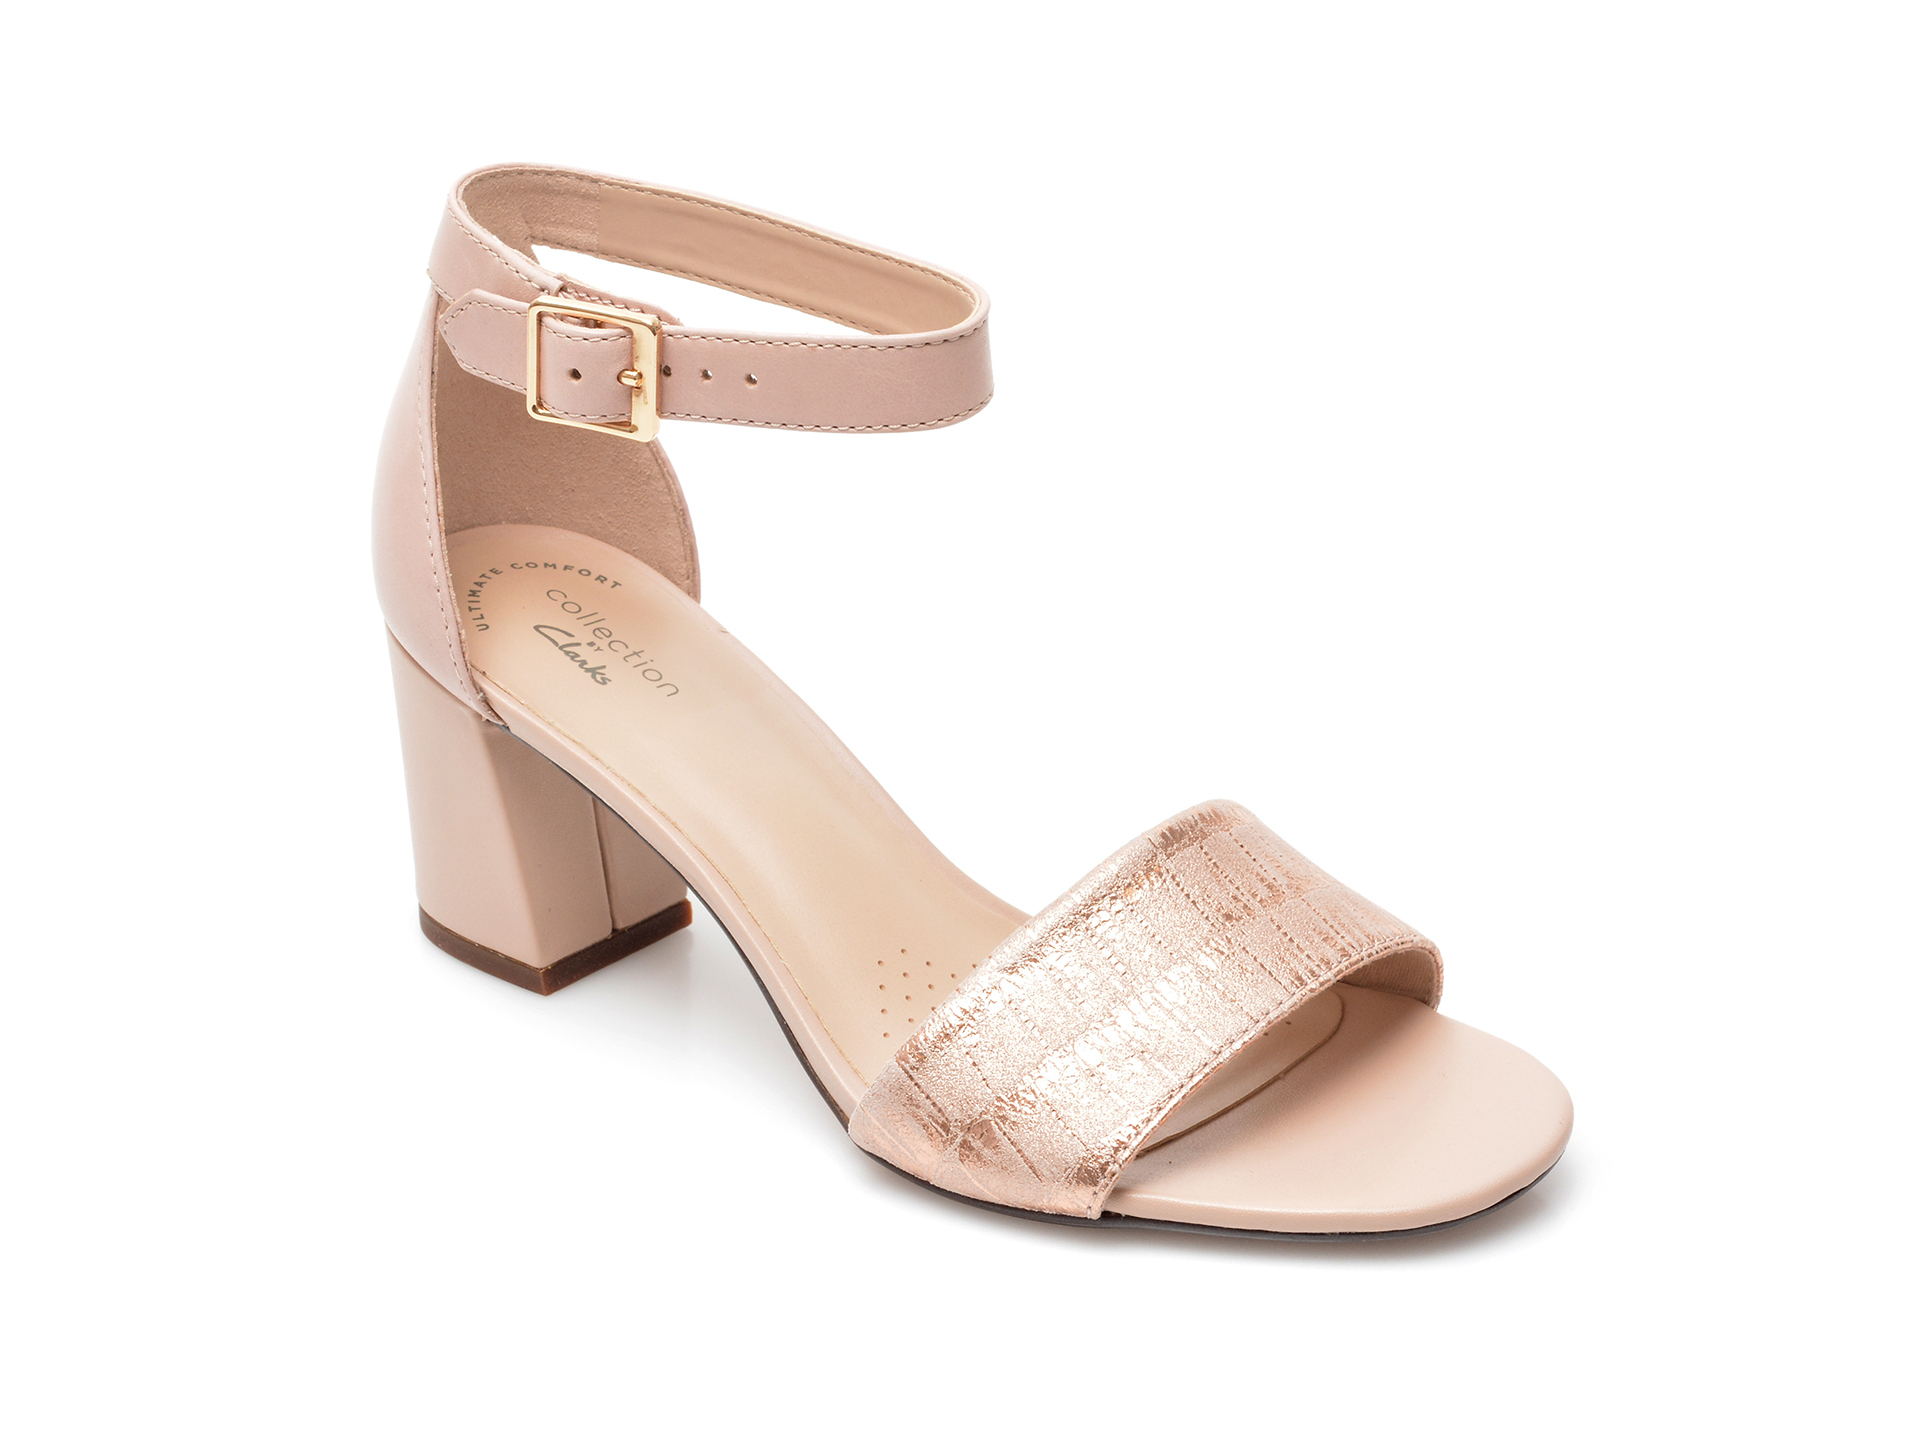 Sandale CLARKS nude, Jocelynne Cam, din piele naturala imagine otter.ro 2021